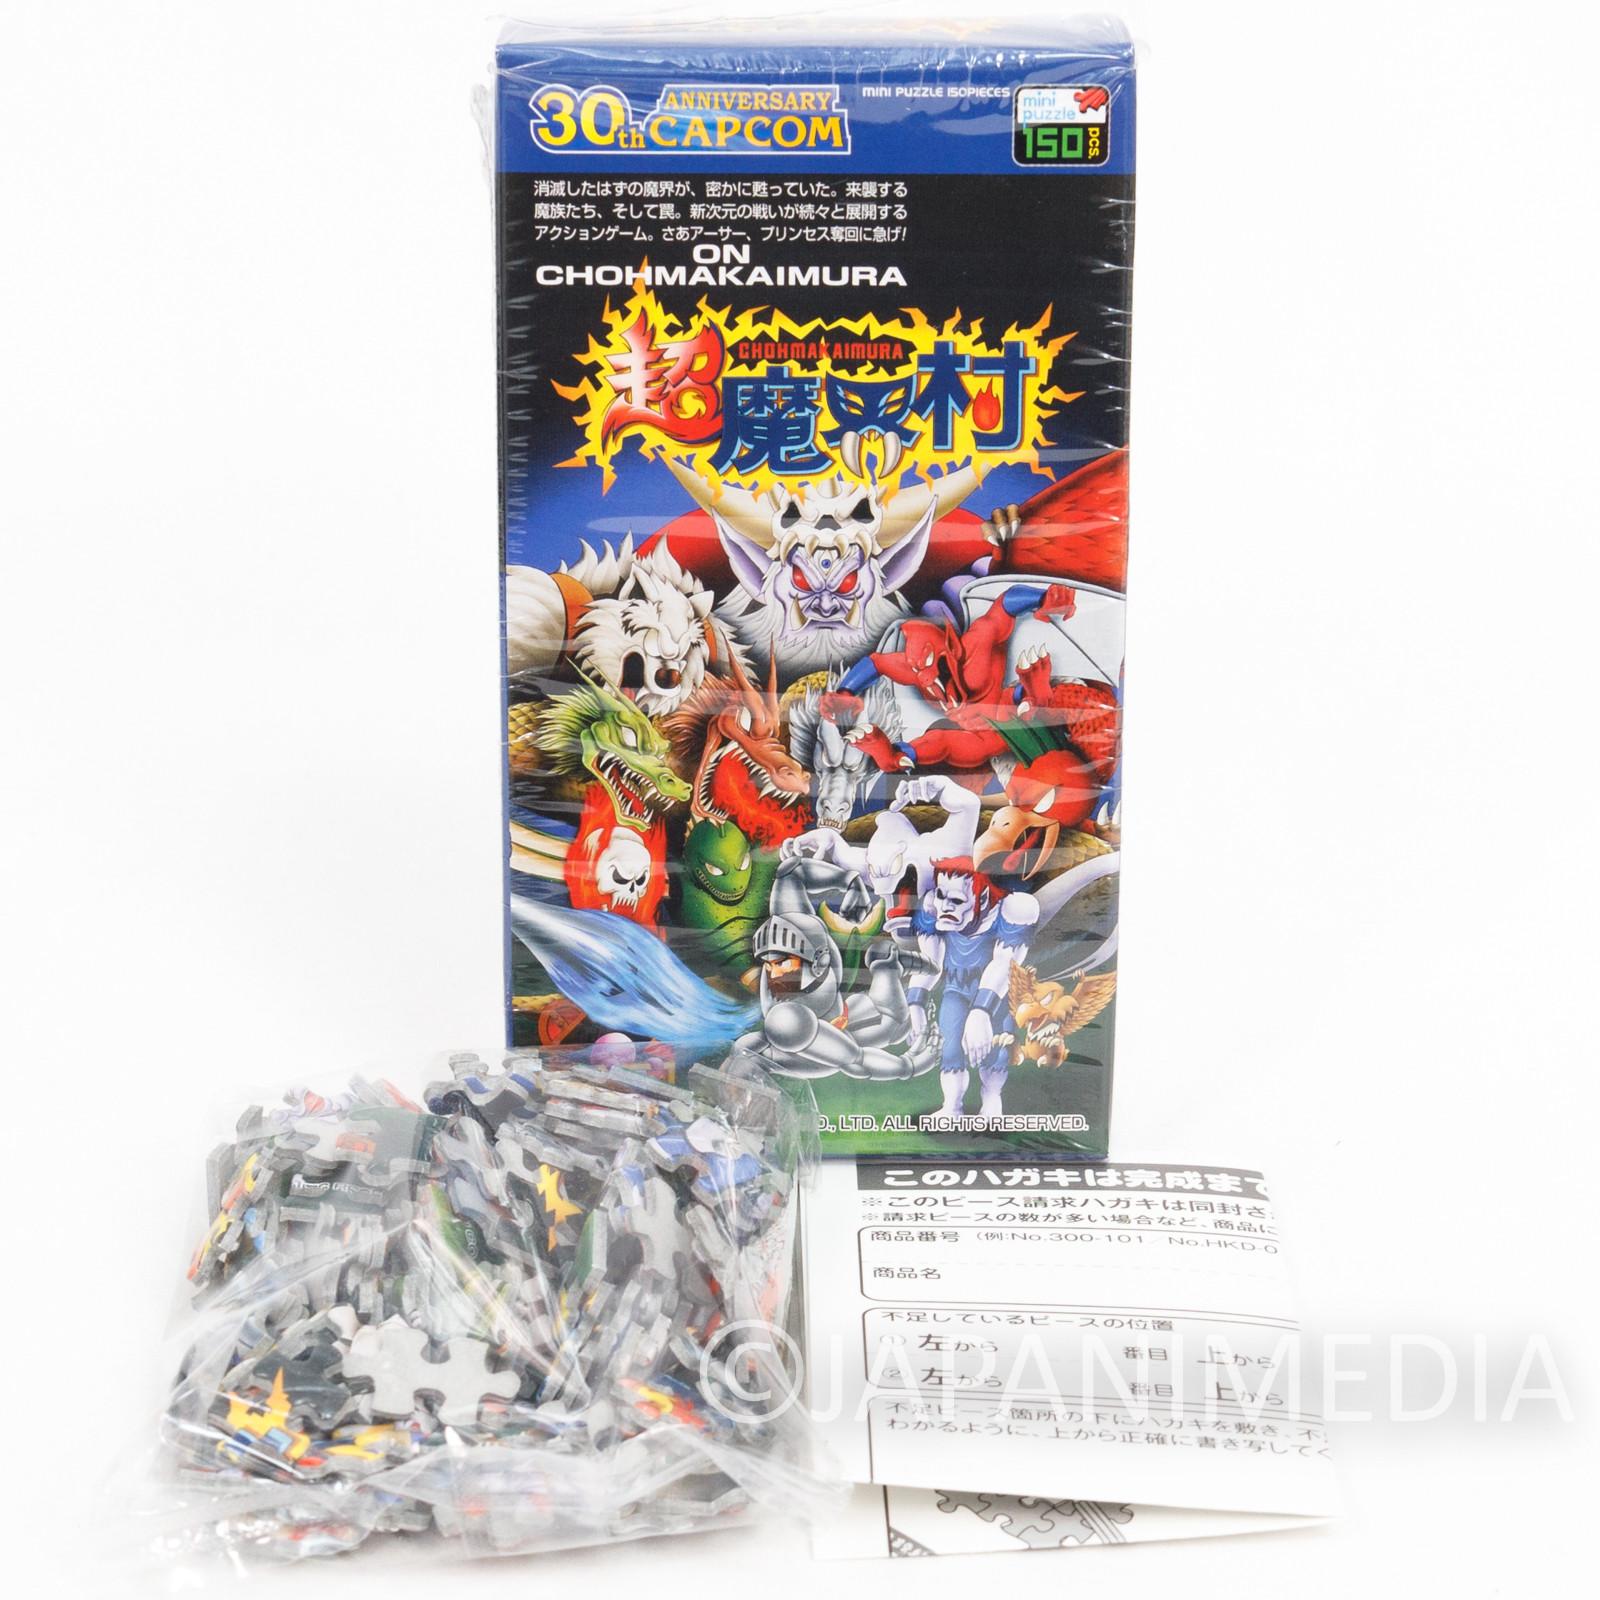 Super Ghouls'n Ghosts Mini Puzzle 150 Piece Capcom Makaimura JAPAN FAMICOM